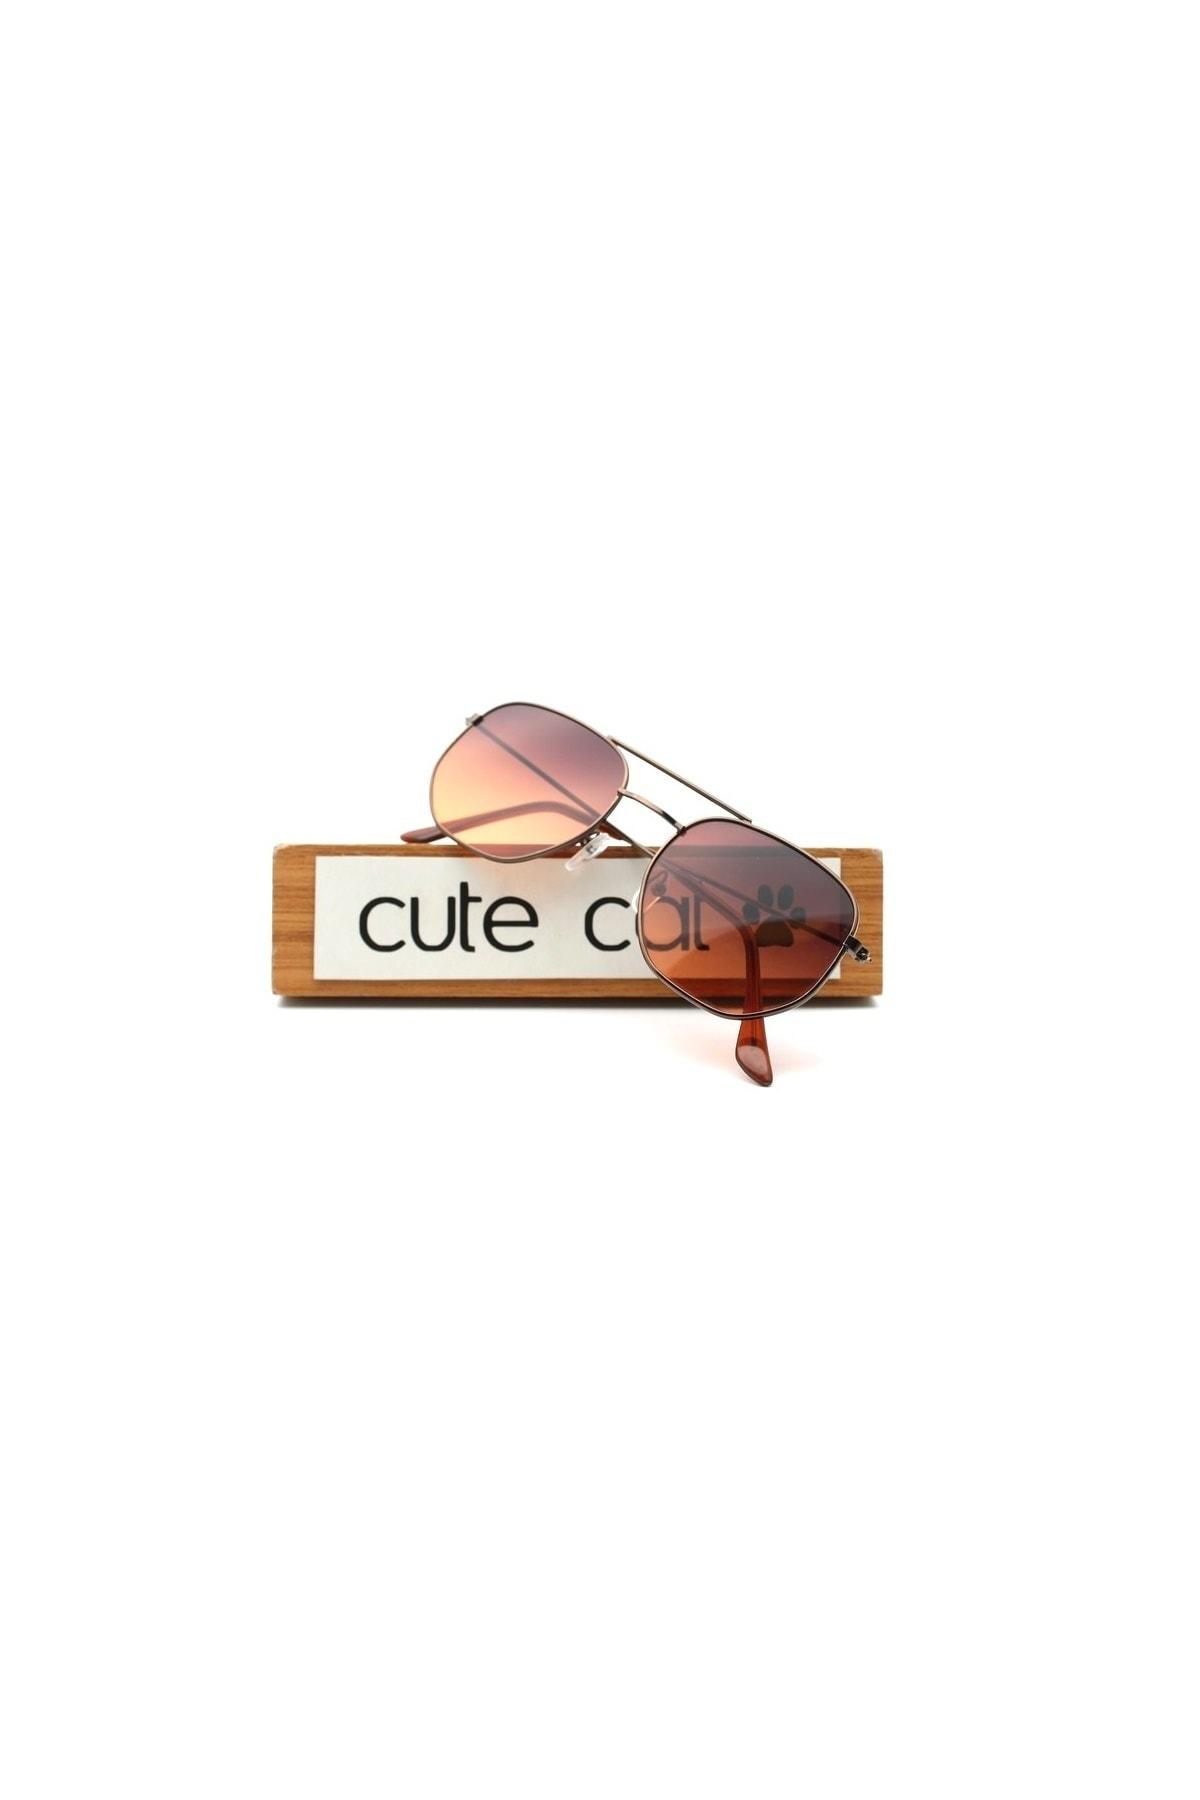 CUTE CAT Hidra Brown Degrade Small Hexagon Unisex Güneş Gözlüğü 2